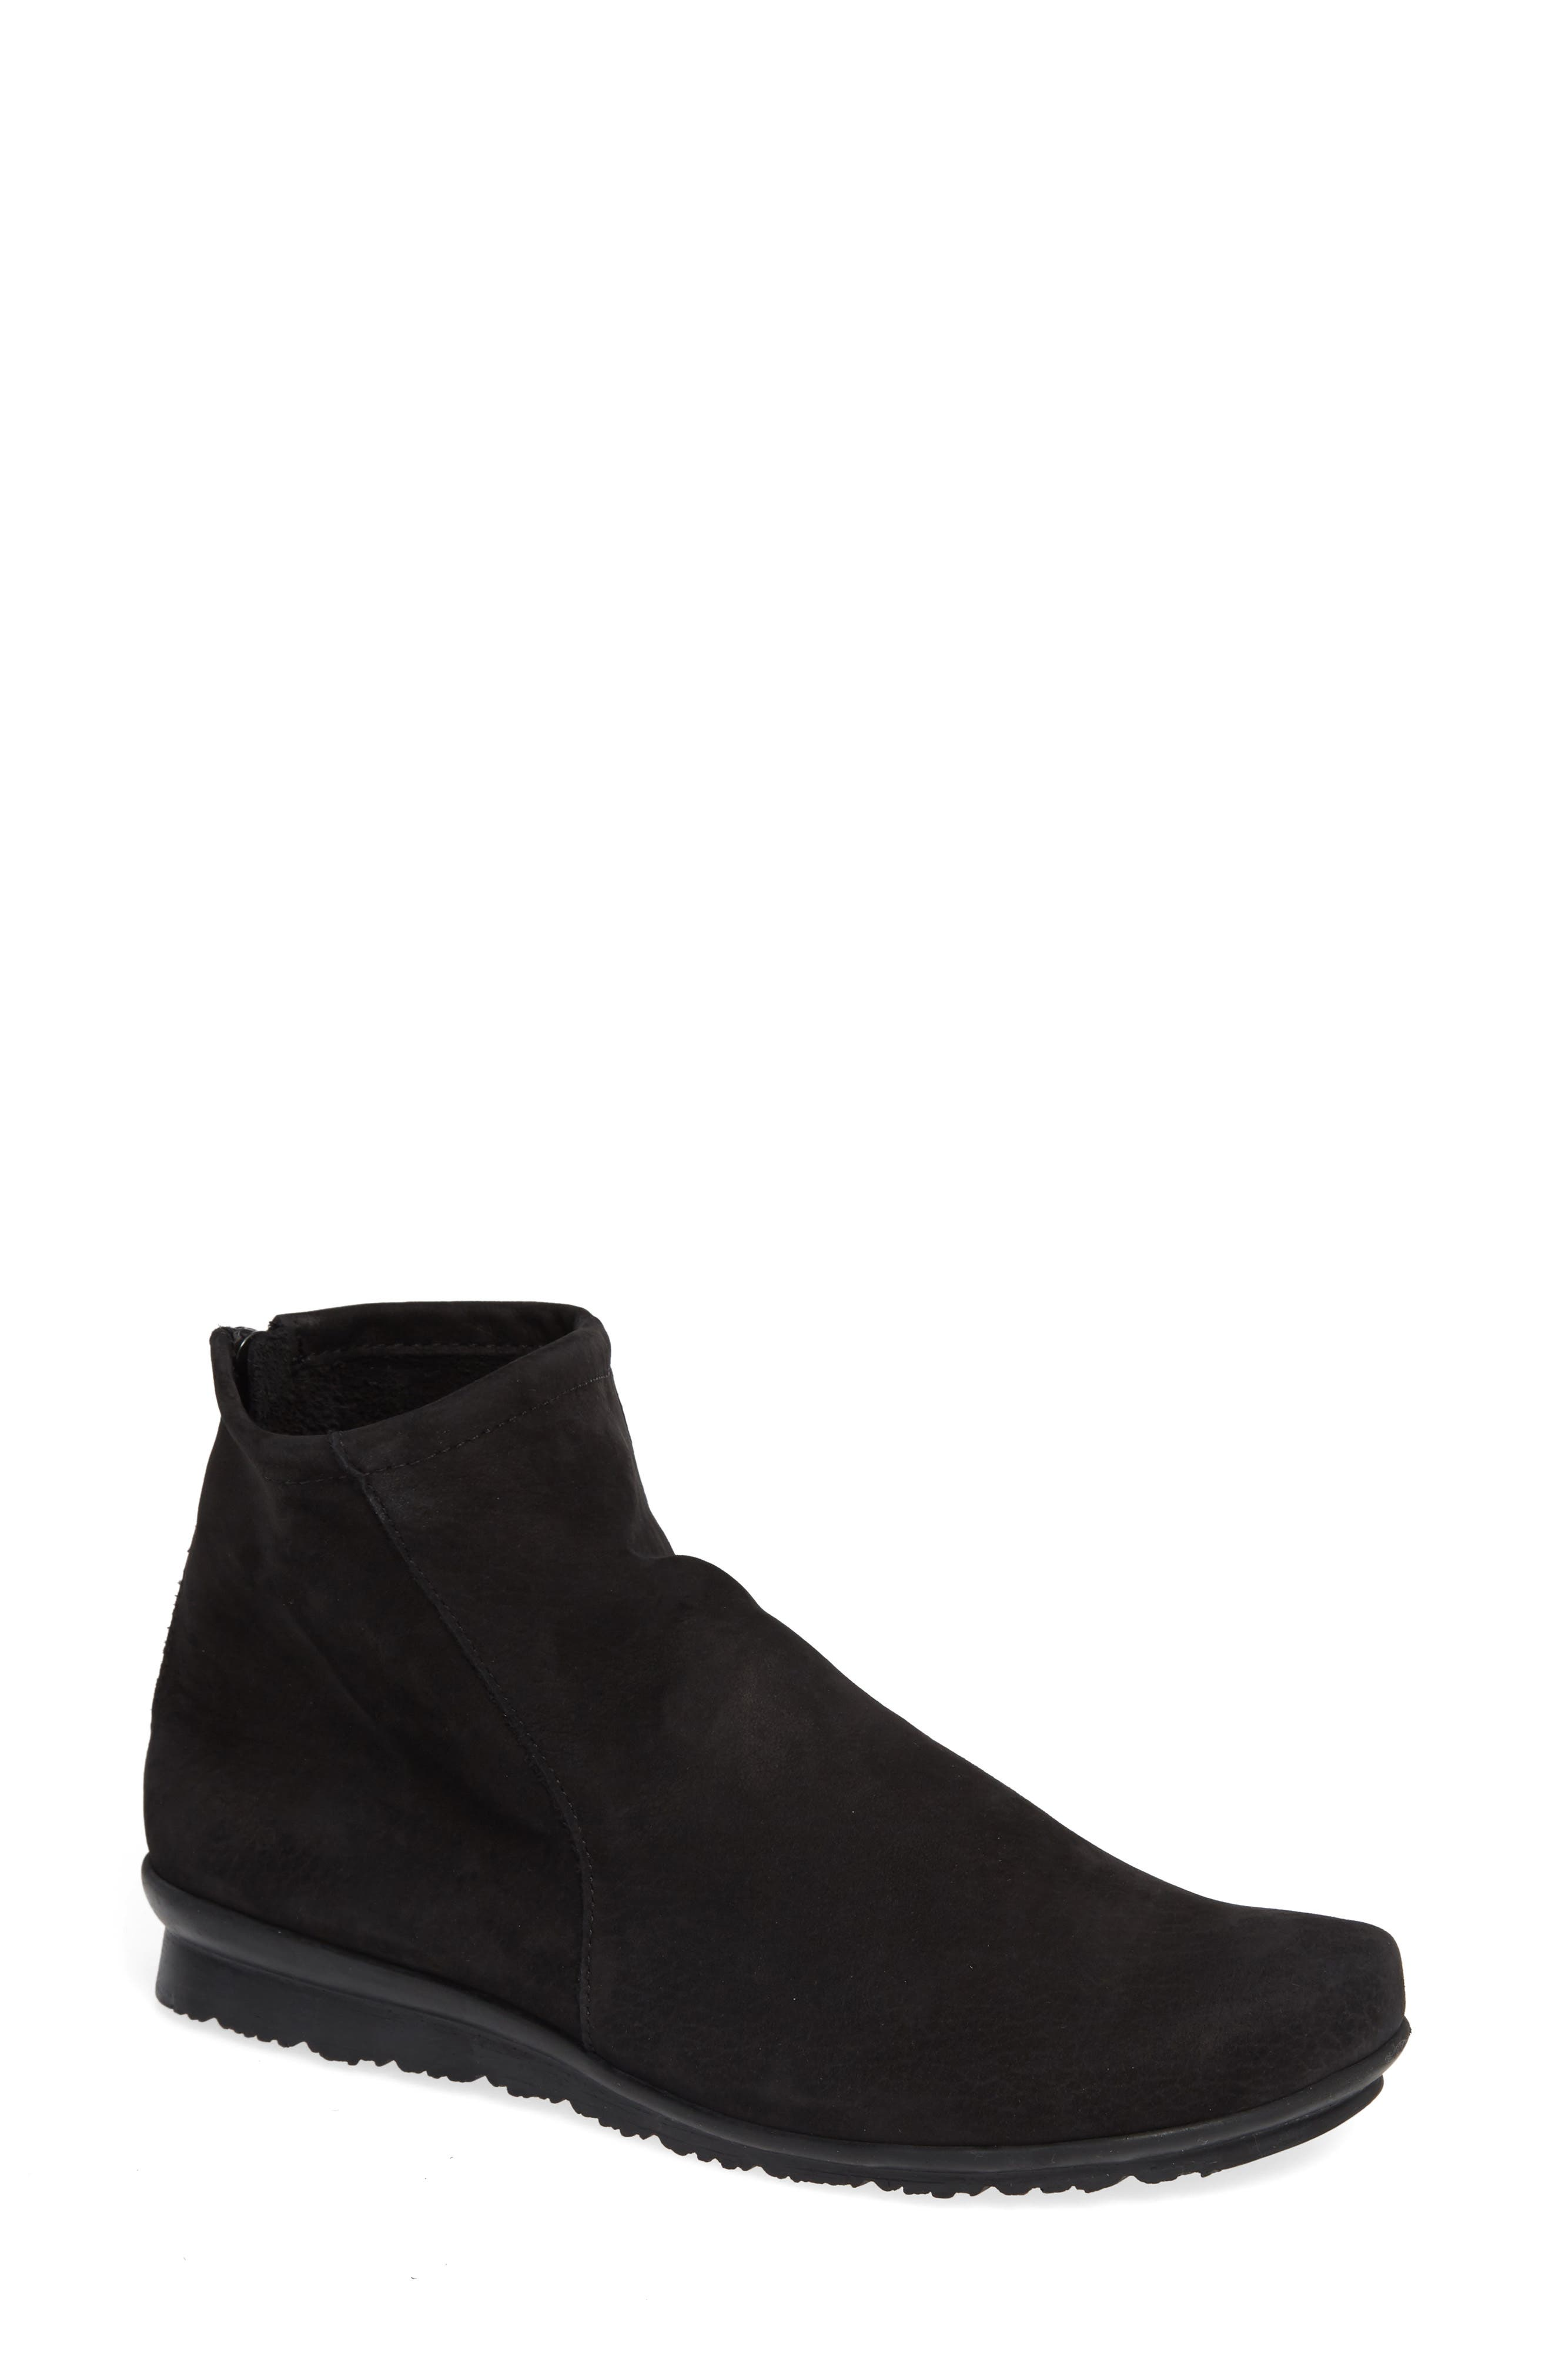 ARCHE 'Baryky' Boot in Black Nubuck